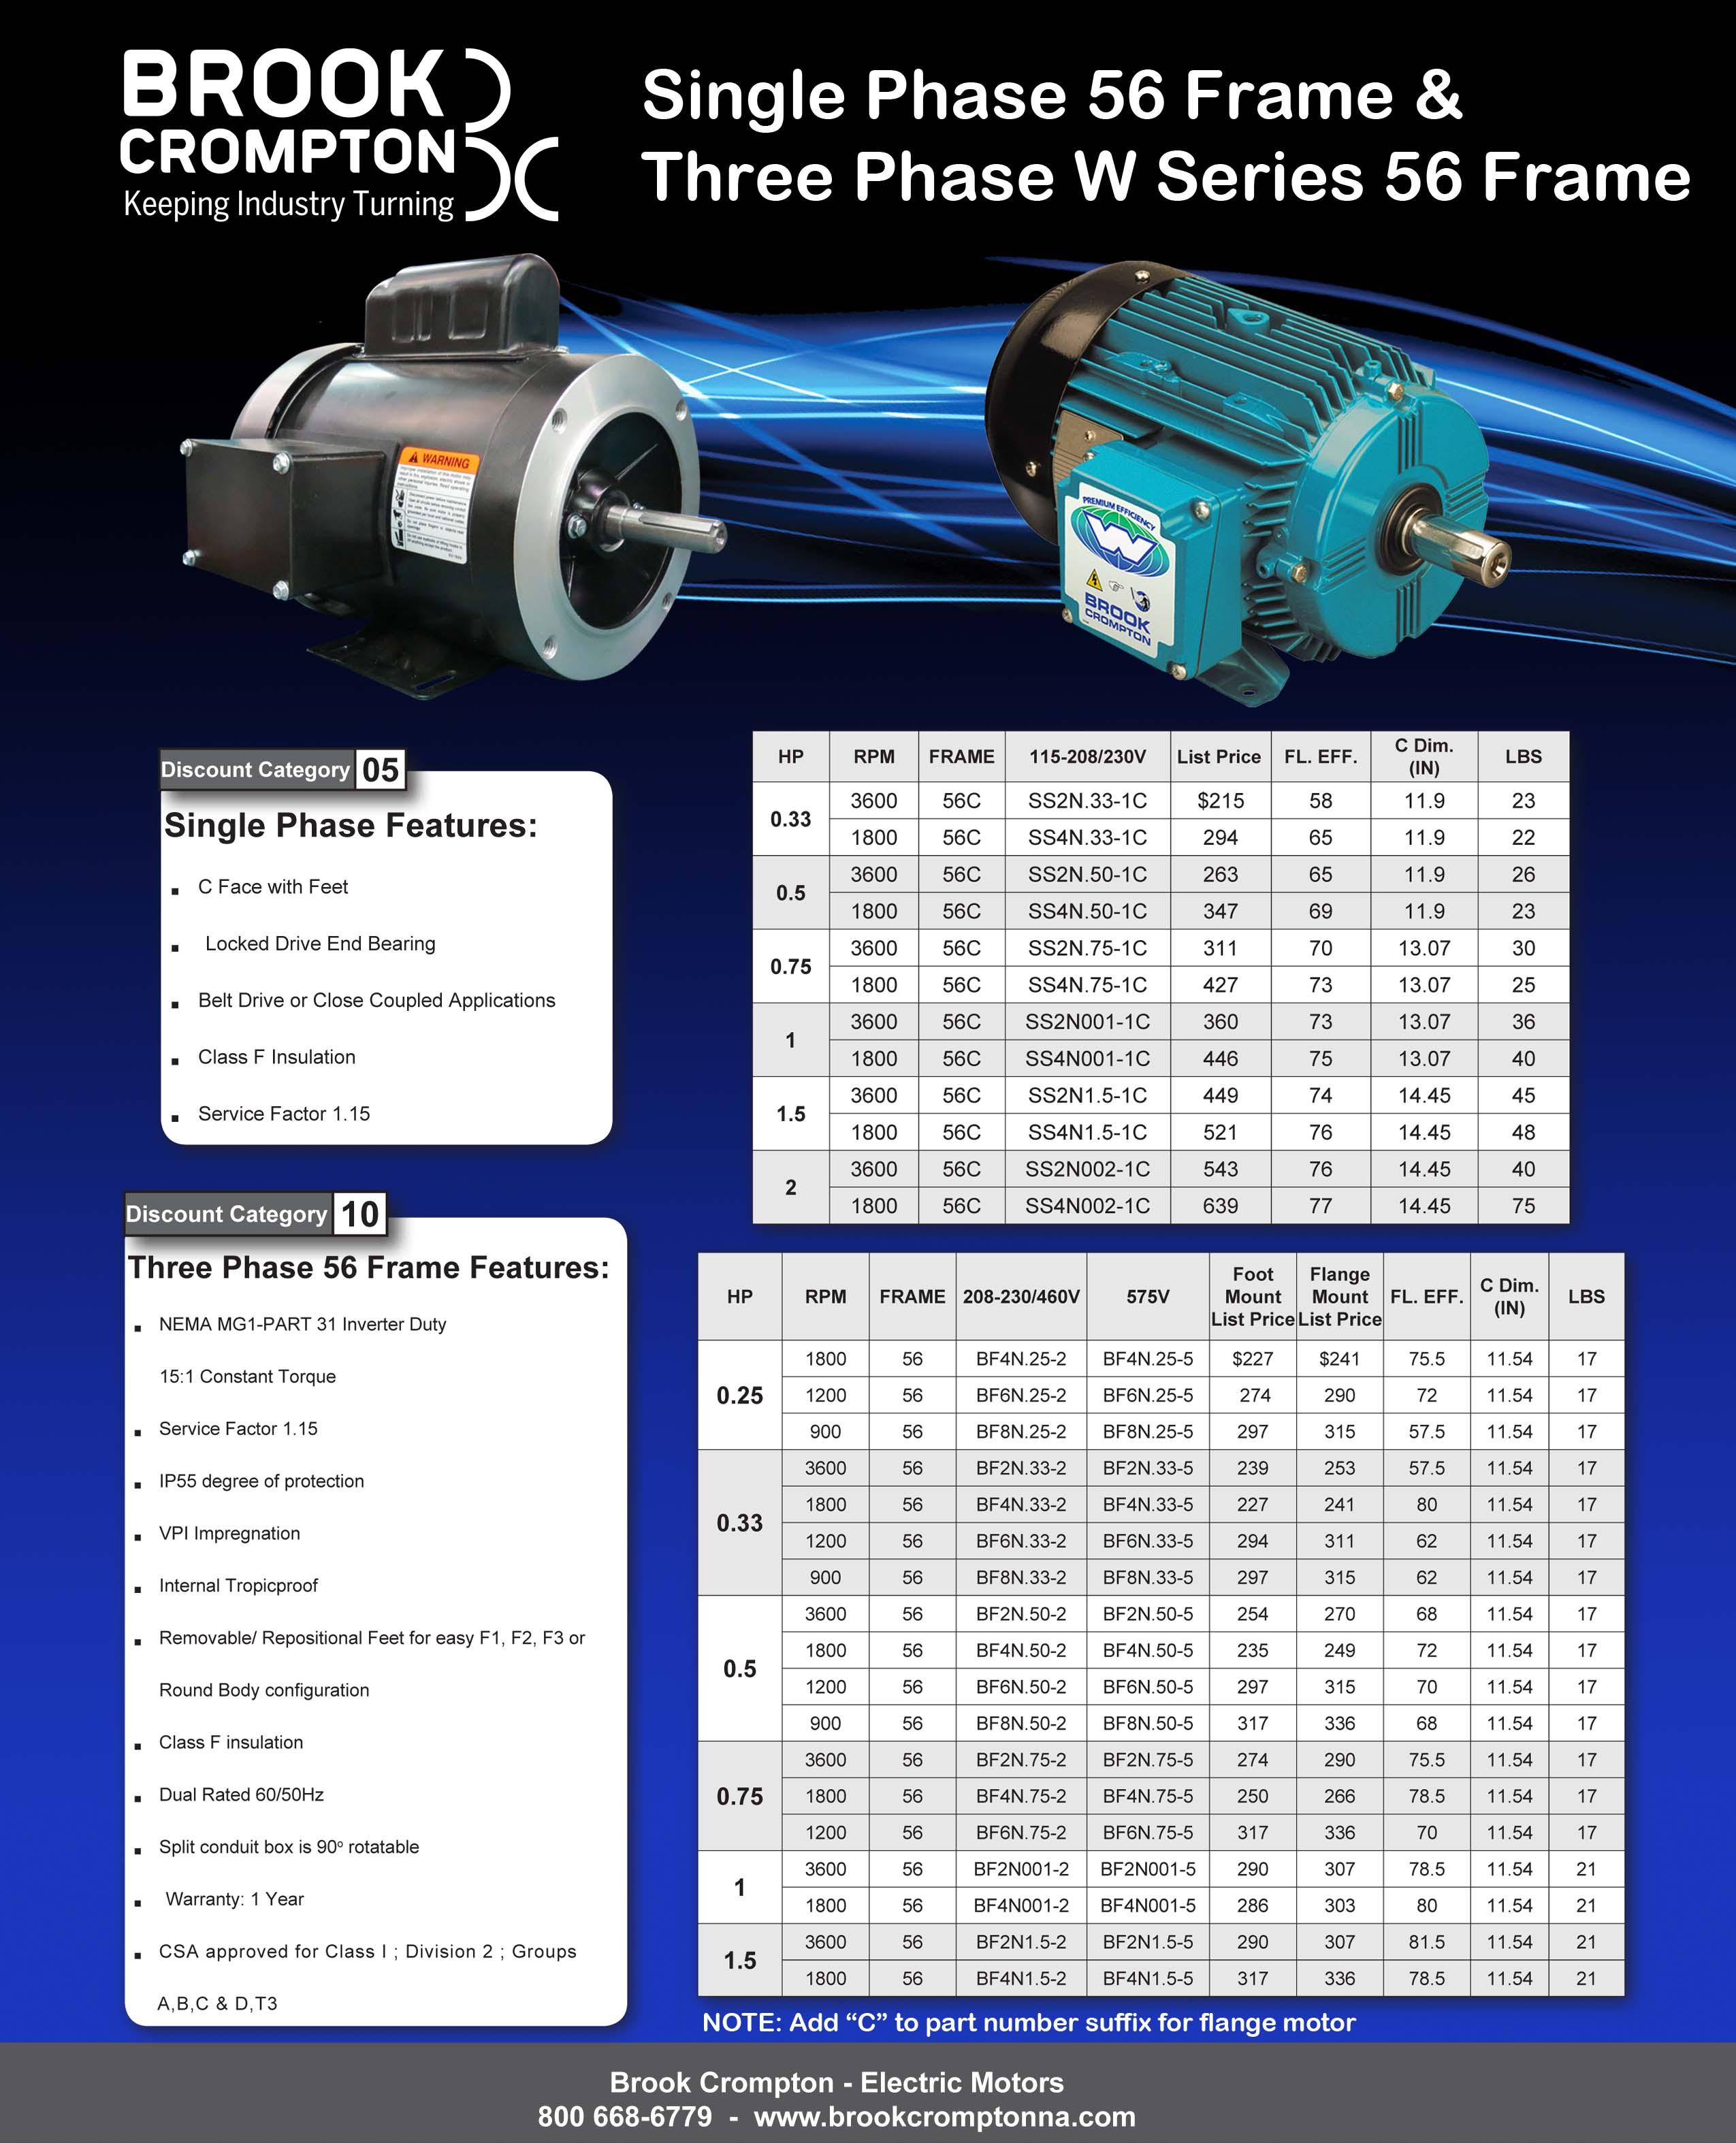 Brook Crompton Americas Electric Motors Catalog